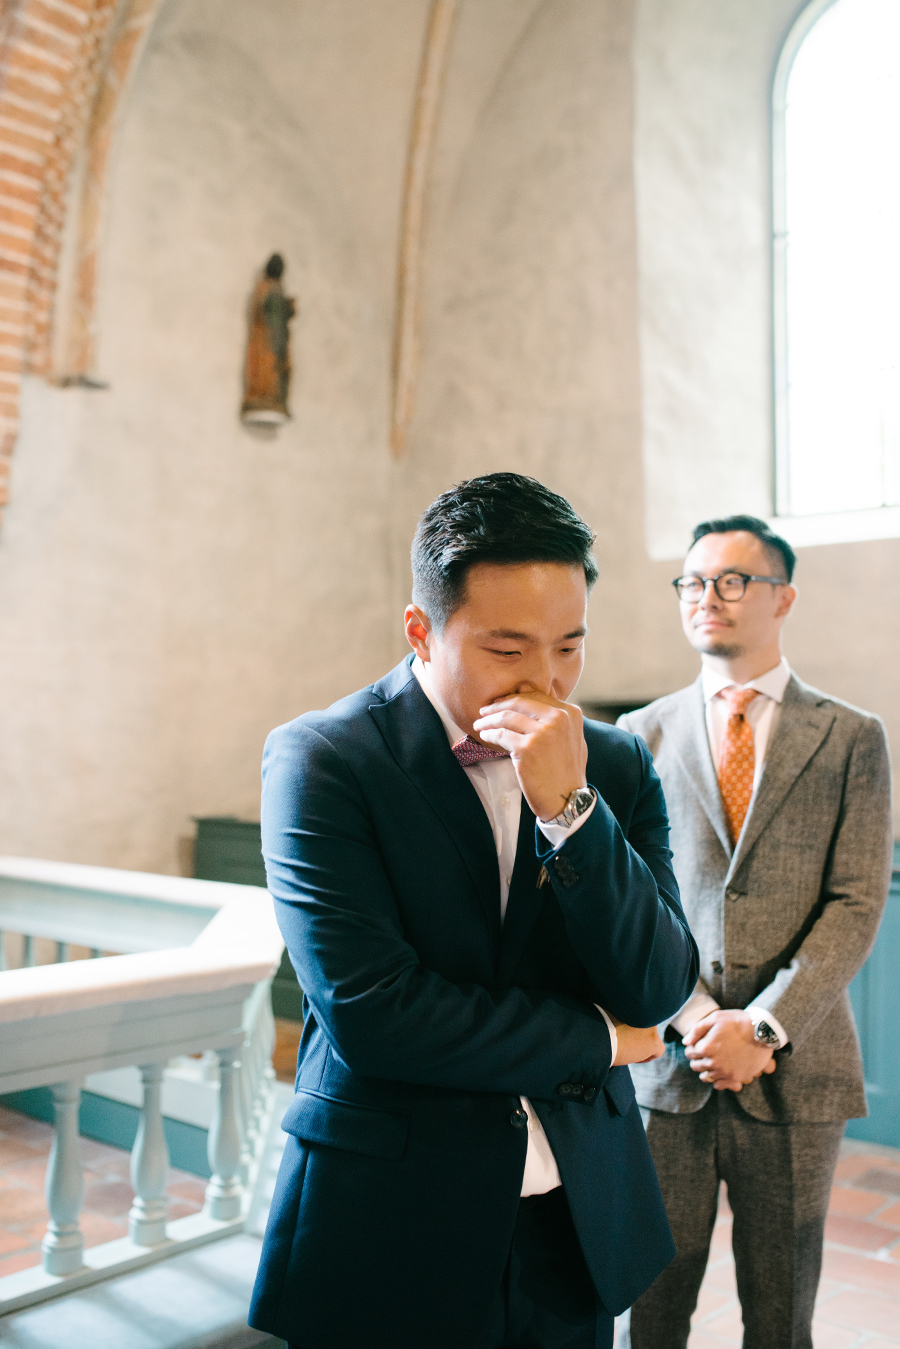 Justina & Lee, Chinese-Lithuanian wedding in Finland, Hääkuvaus Turku (3).jpg